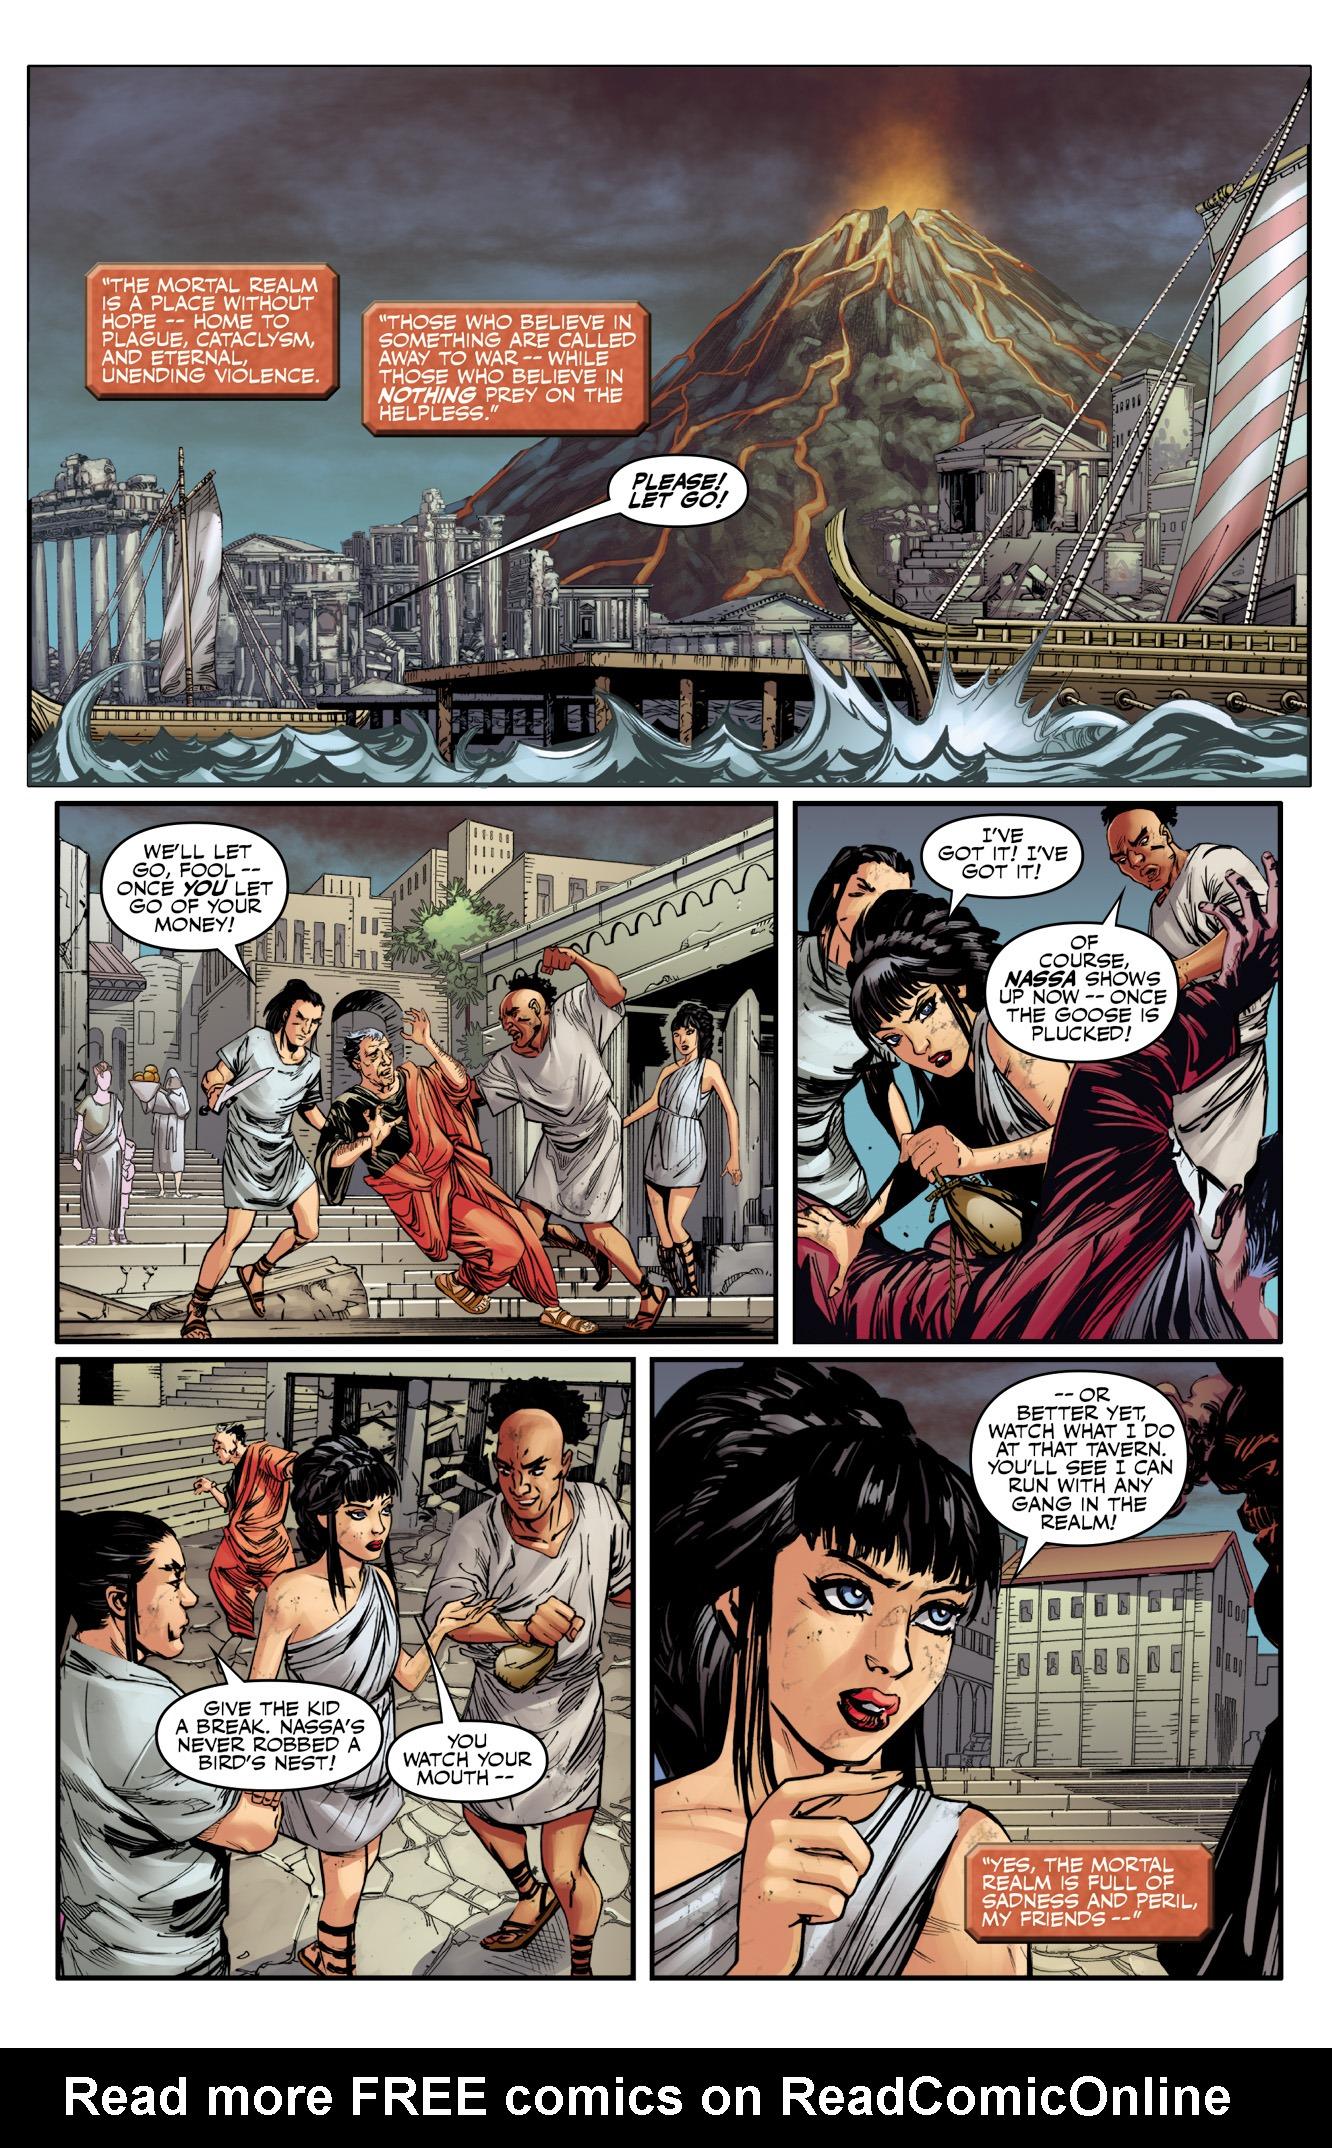 Read online SMITE comic -  Issue # Full - 3